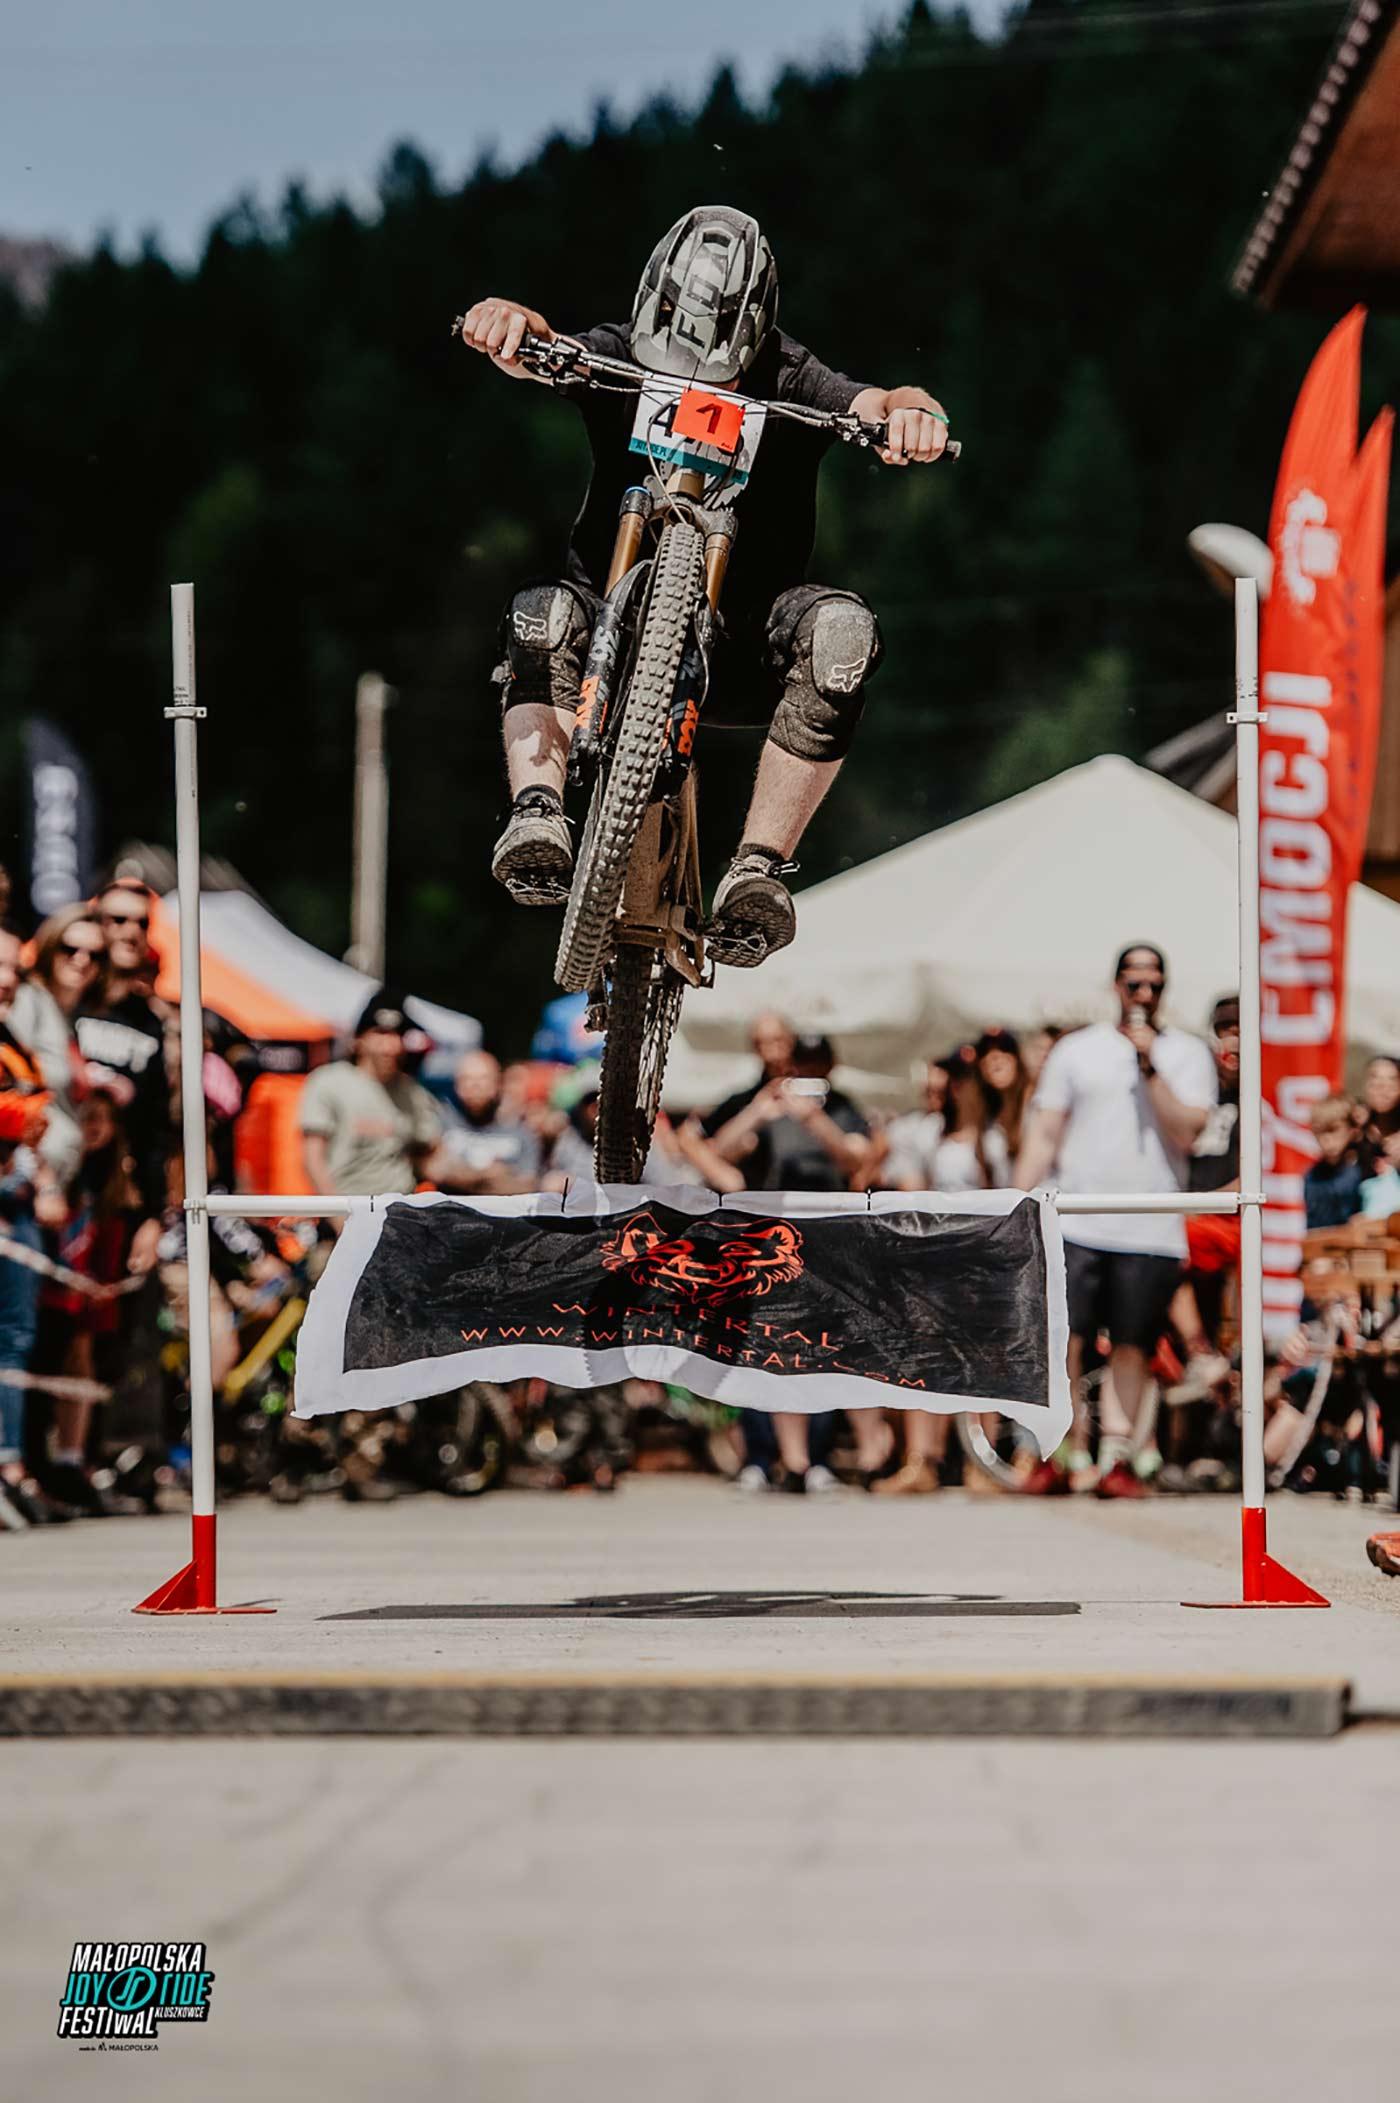 Małopolska Joy Ride Festiwal 2021 3